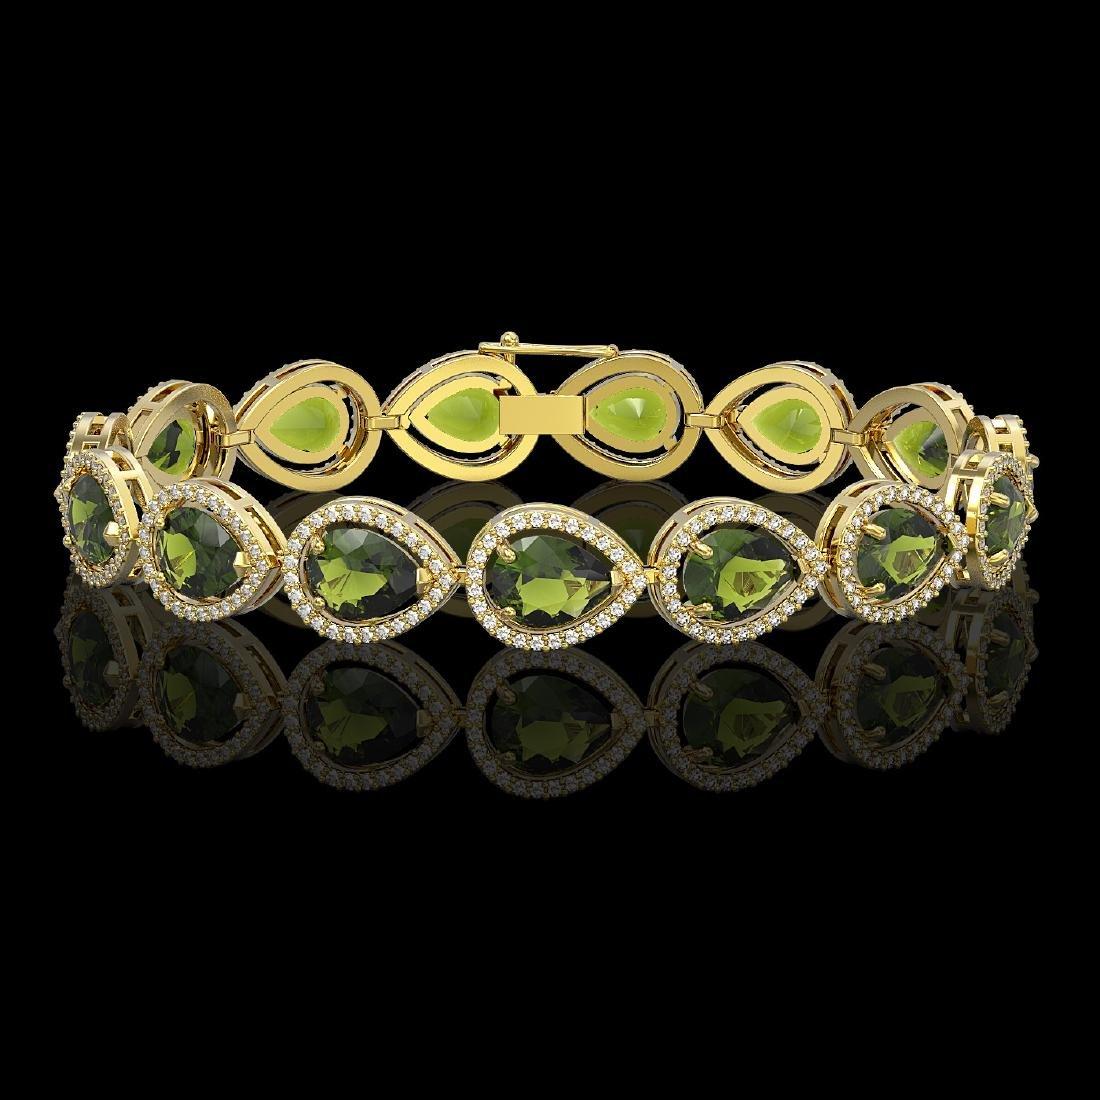 19.7 CTW Tourmaline & Diamond Halo Bracelet 10K Yellow